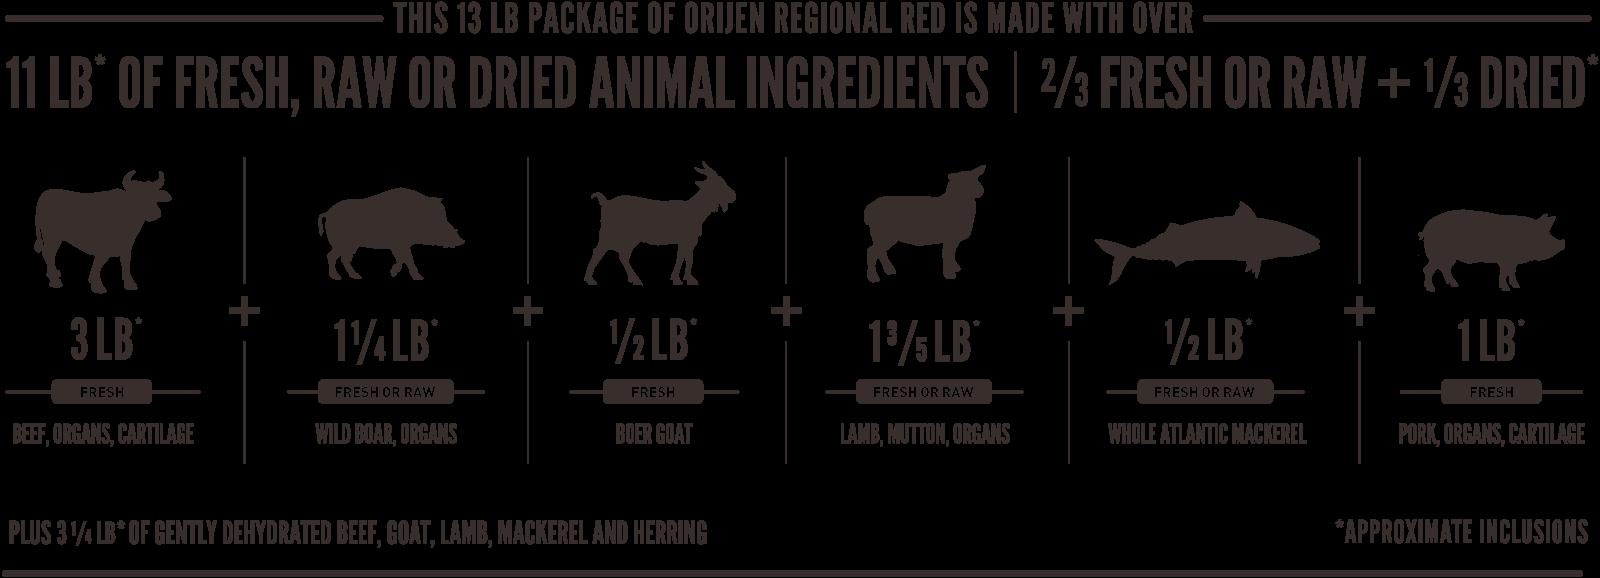 ORIJEN Regional Red Meatmath Formula and Dog Food Ingredients